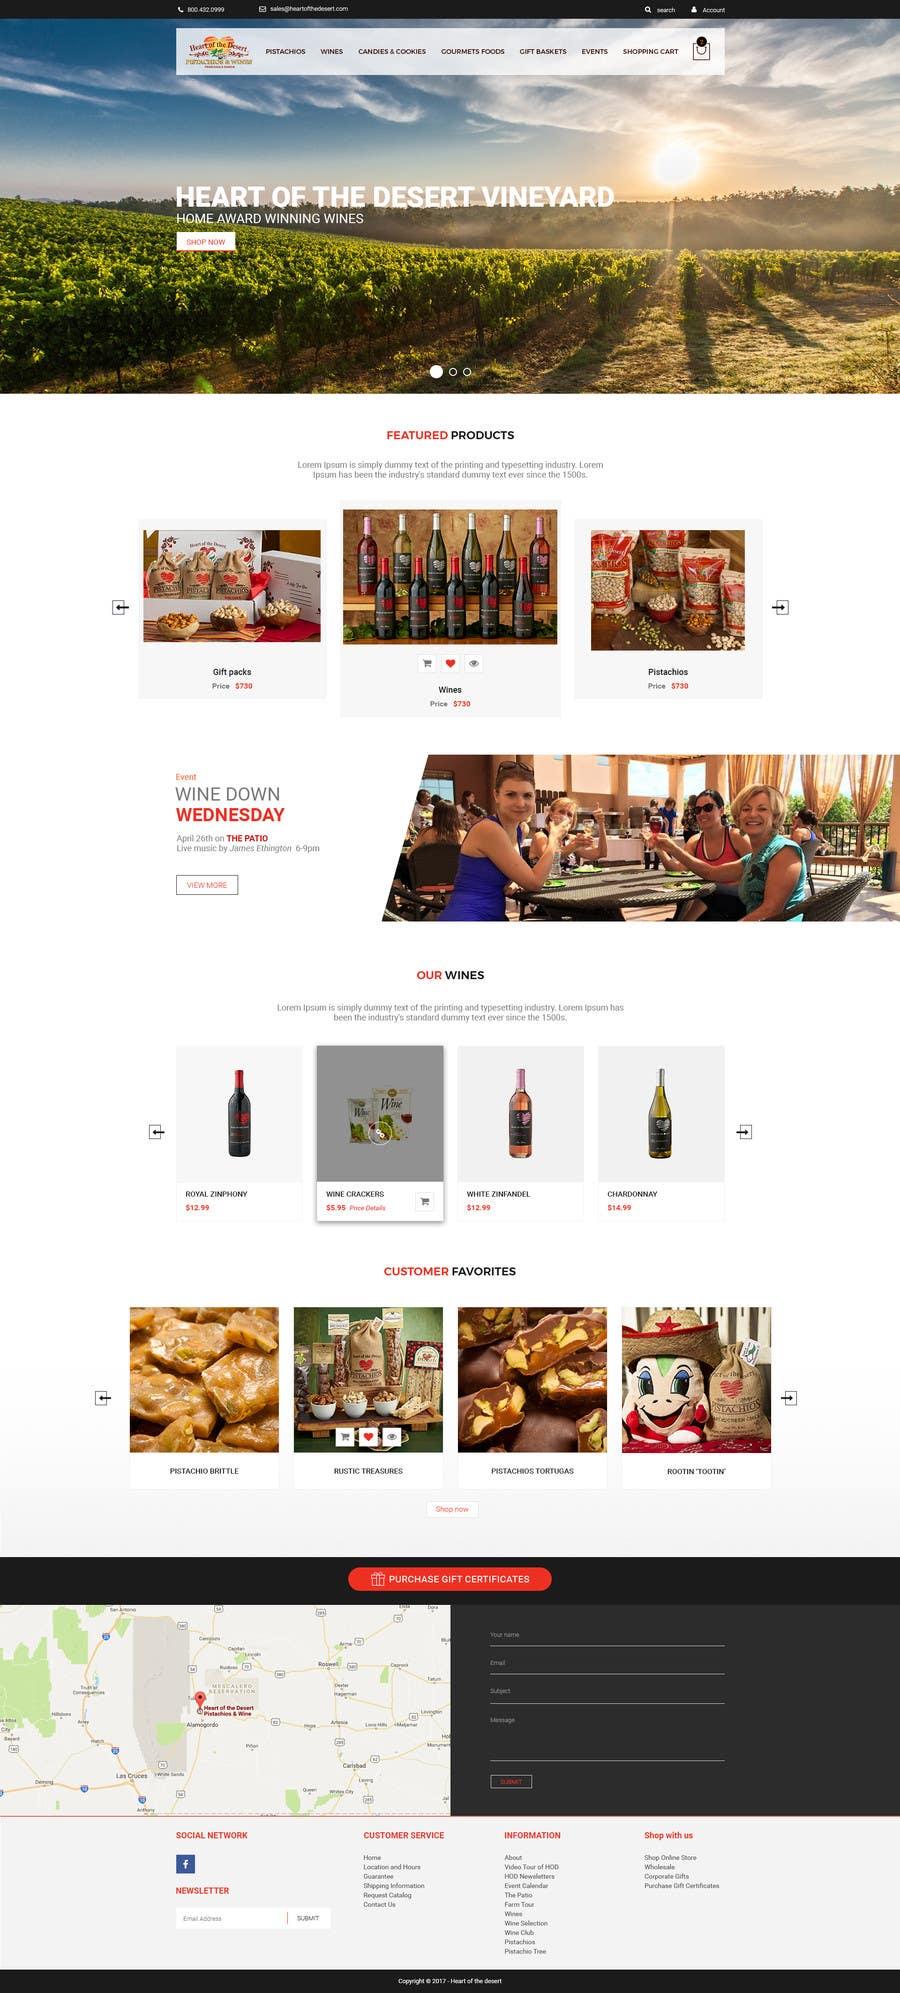 Proposition n°14 du concours Design a Website Mockup for E-commerce Site